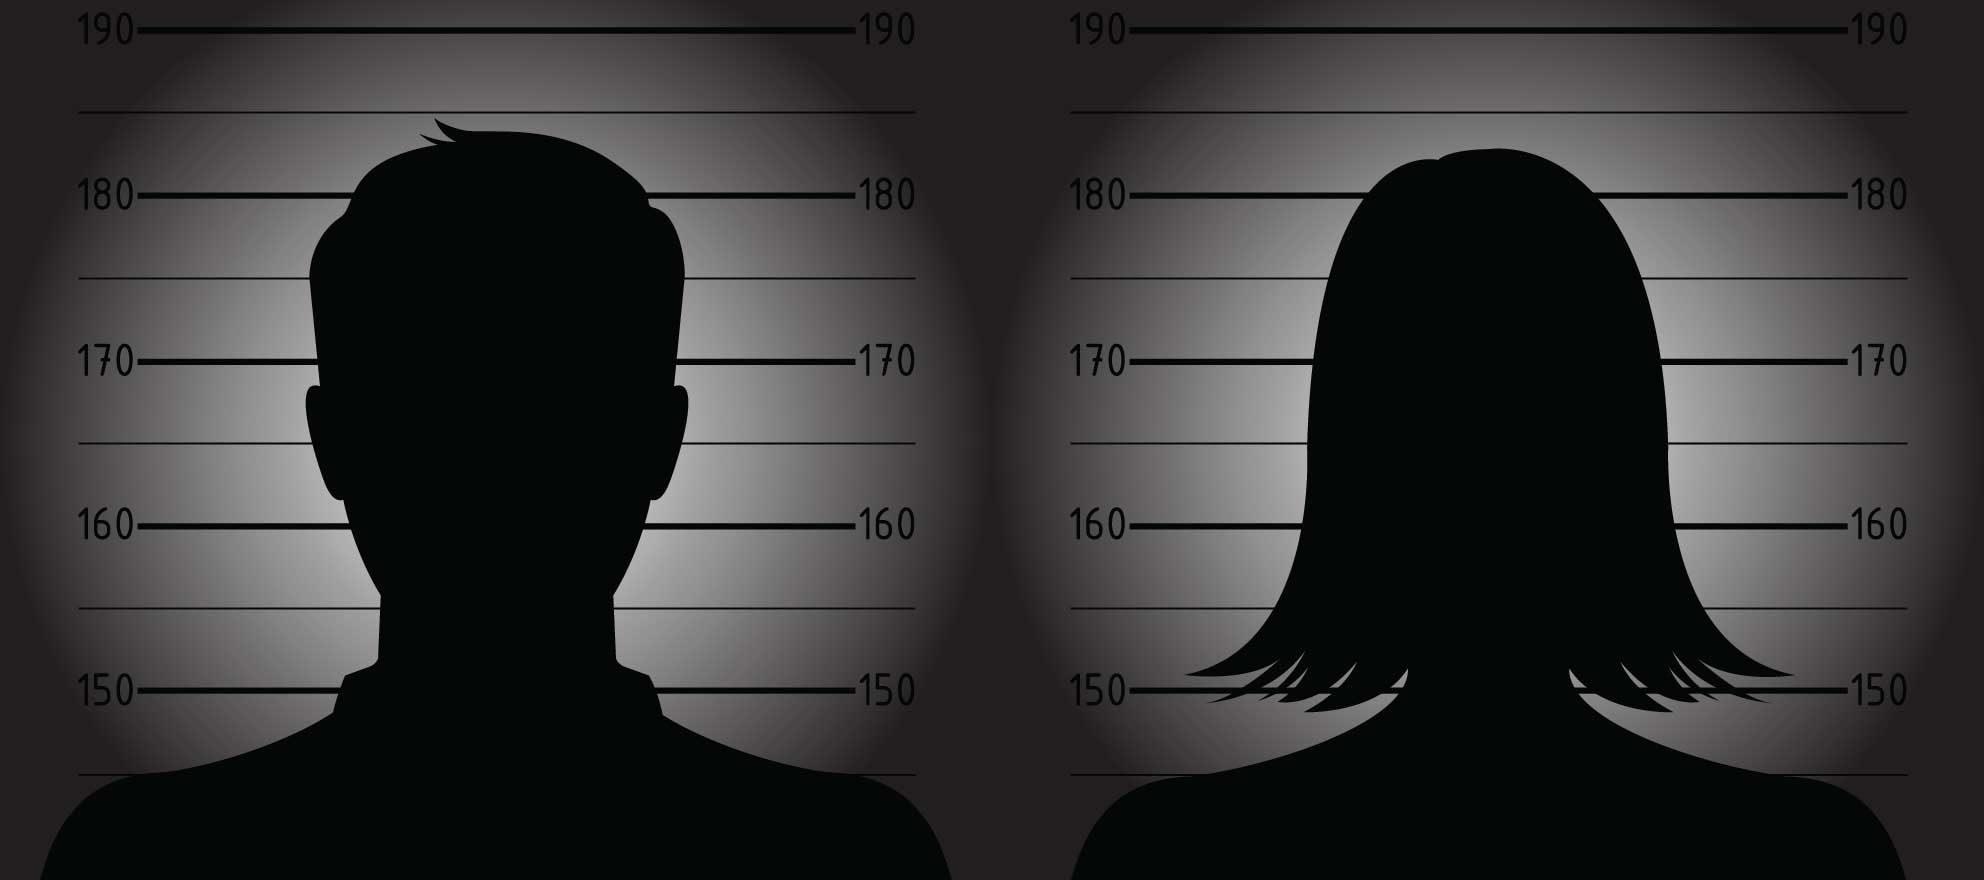 End-to-end rental platform will run criminal background checks on applicants